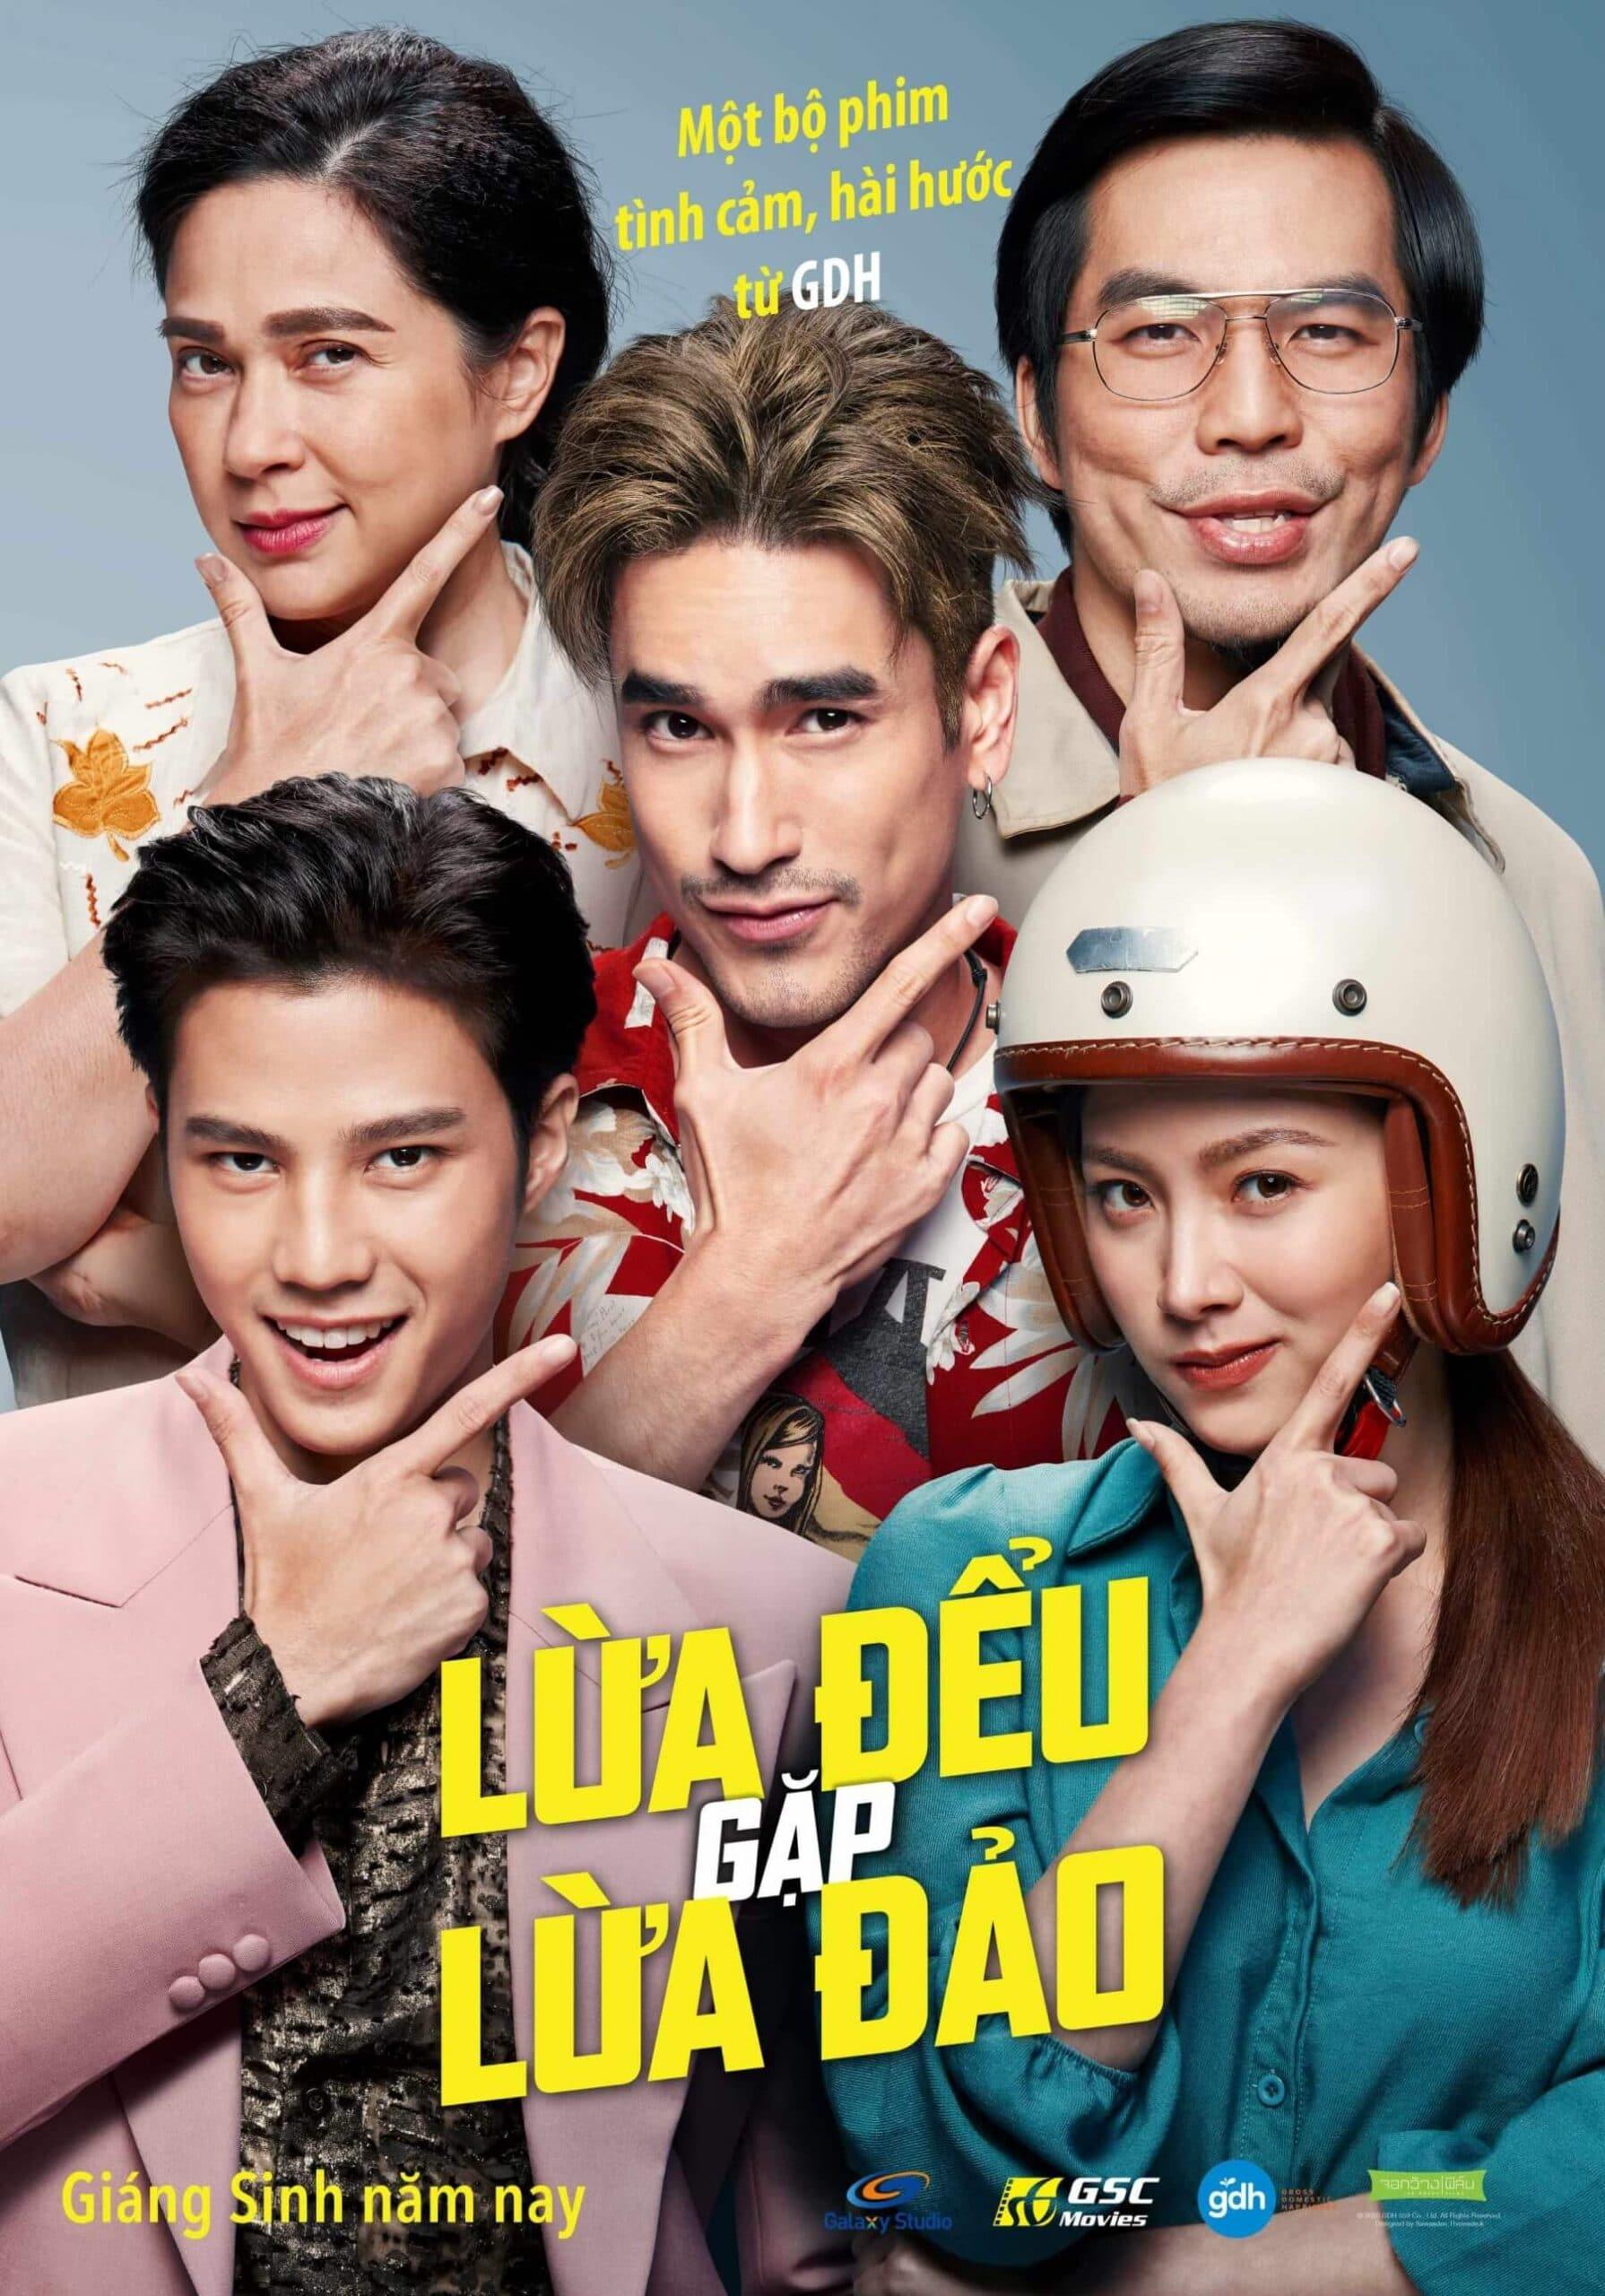 Poster phim The Con Heartis (Lừa Đểu Gặp Lừa Đảo)